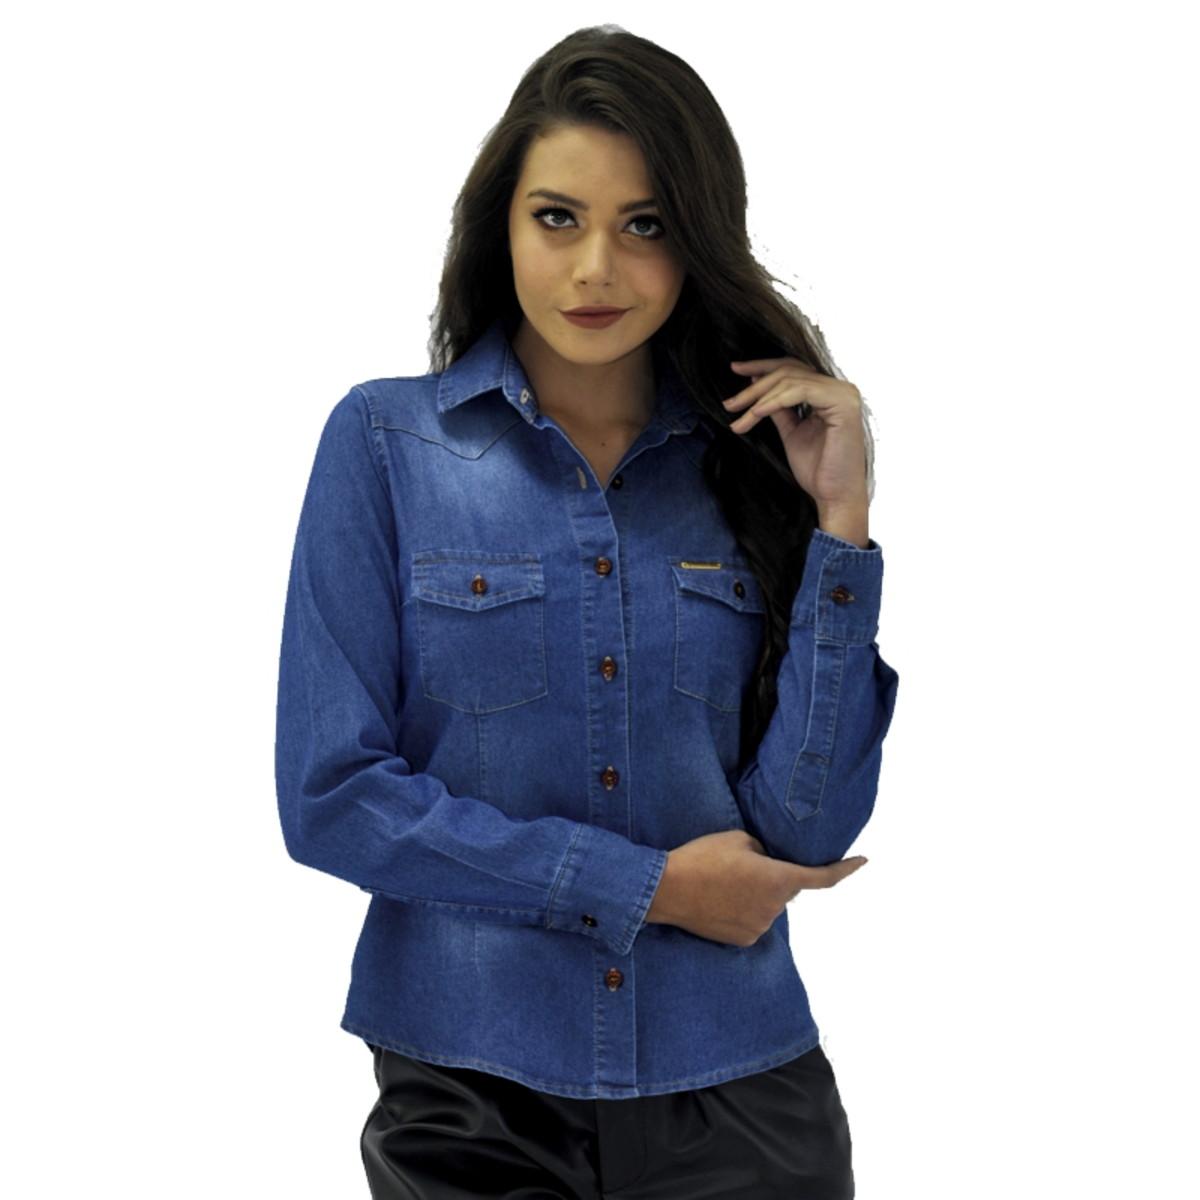 754cd362a Camisa Feminina Jeans Manga Longa no Elo7 | Chemizz Camisaria (D1997F)